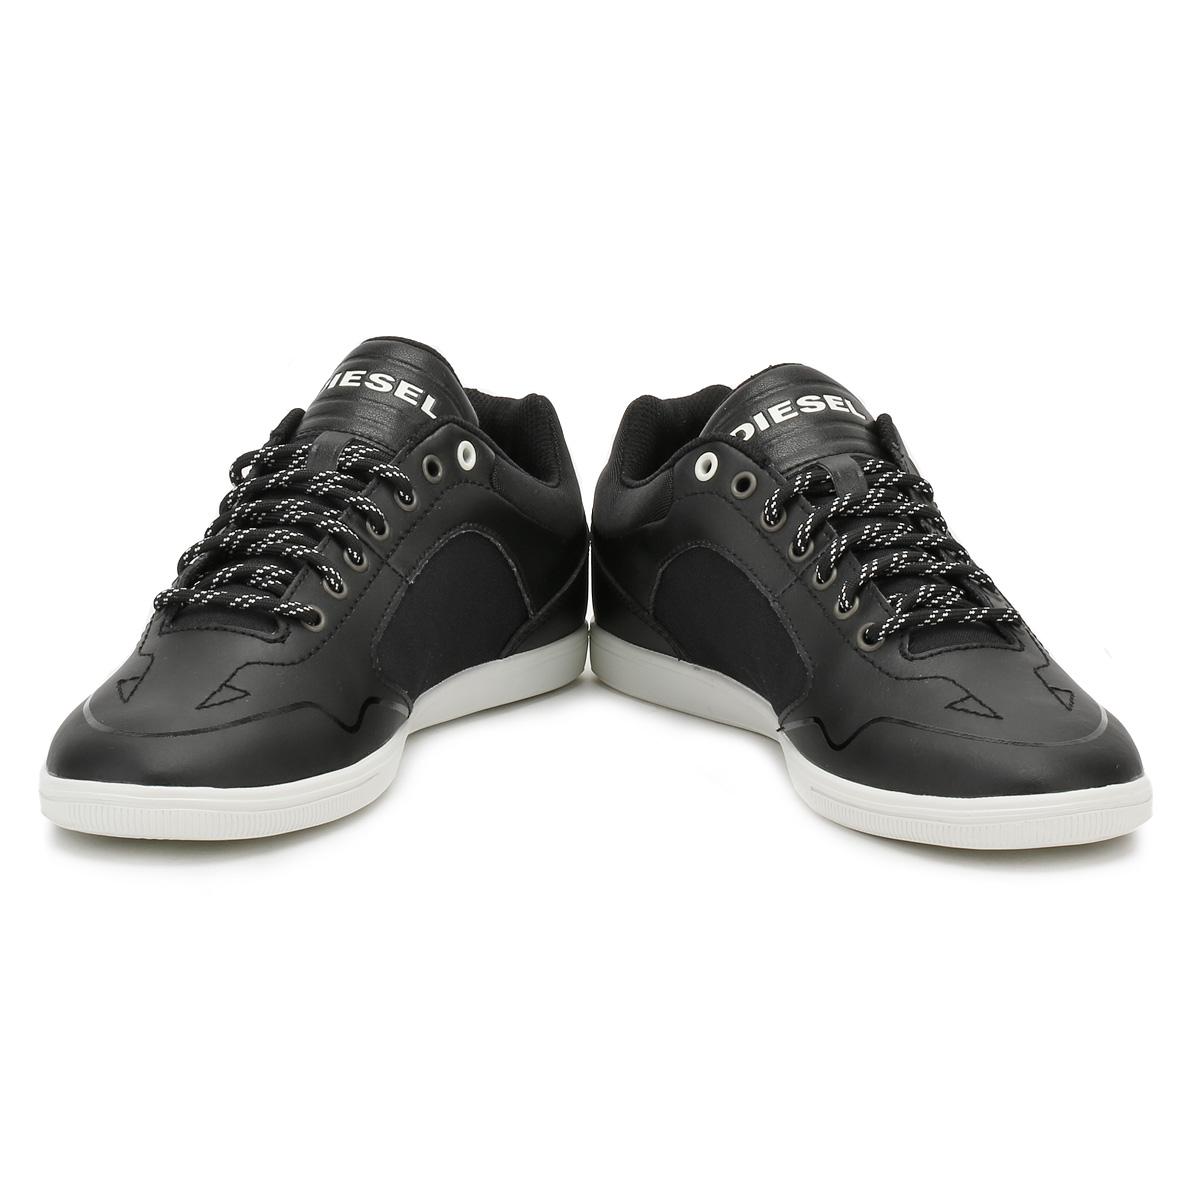 Diesel Shoes Dstring Black